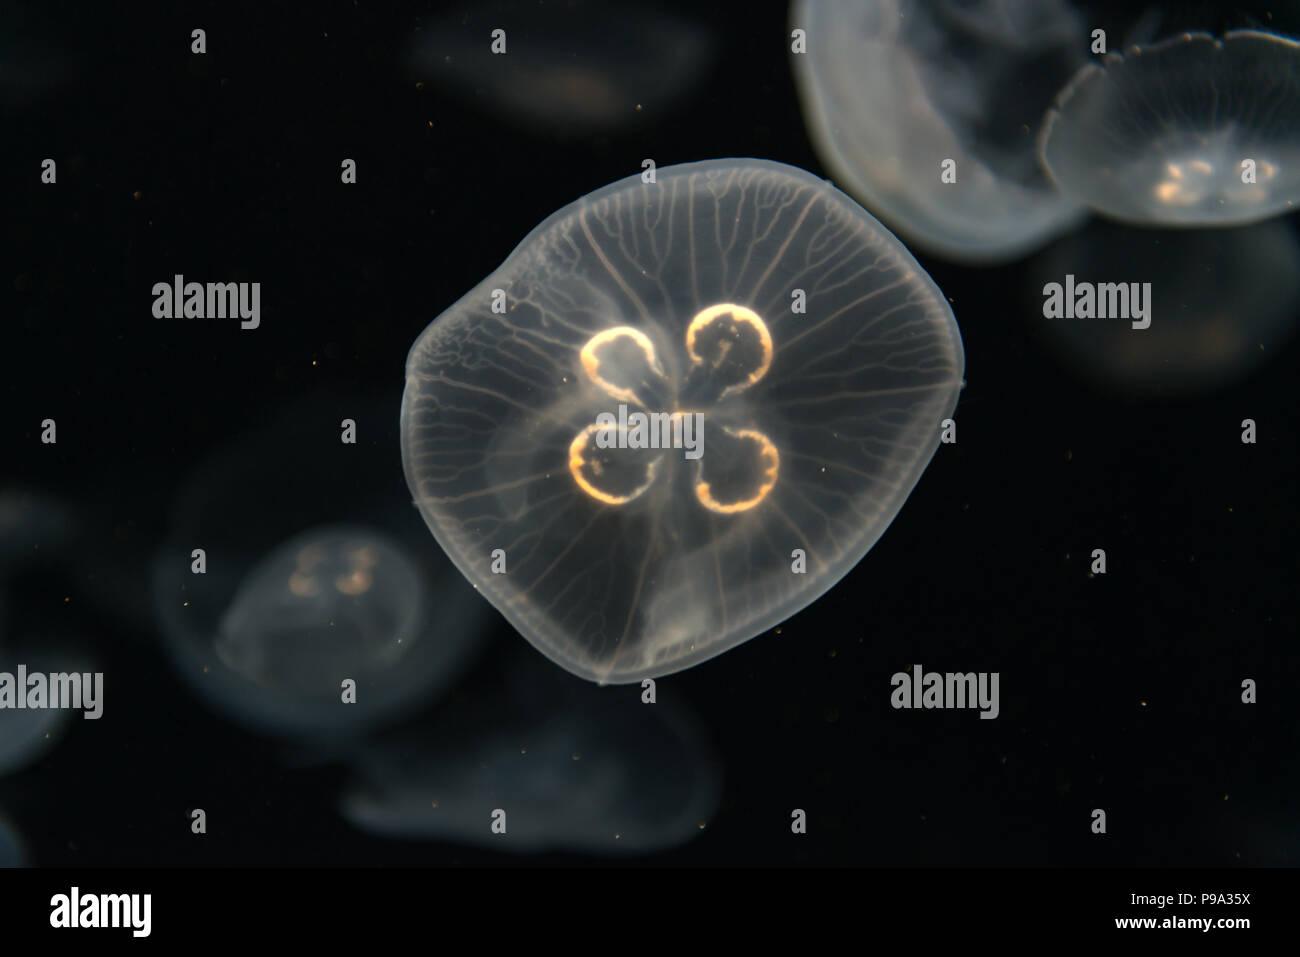 Les méduses Rhizostoma pulmo ou flottant dans l'aquarium Photo Stock